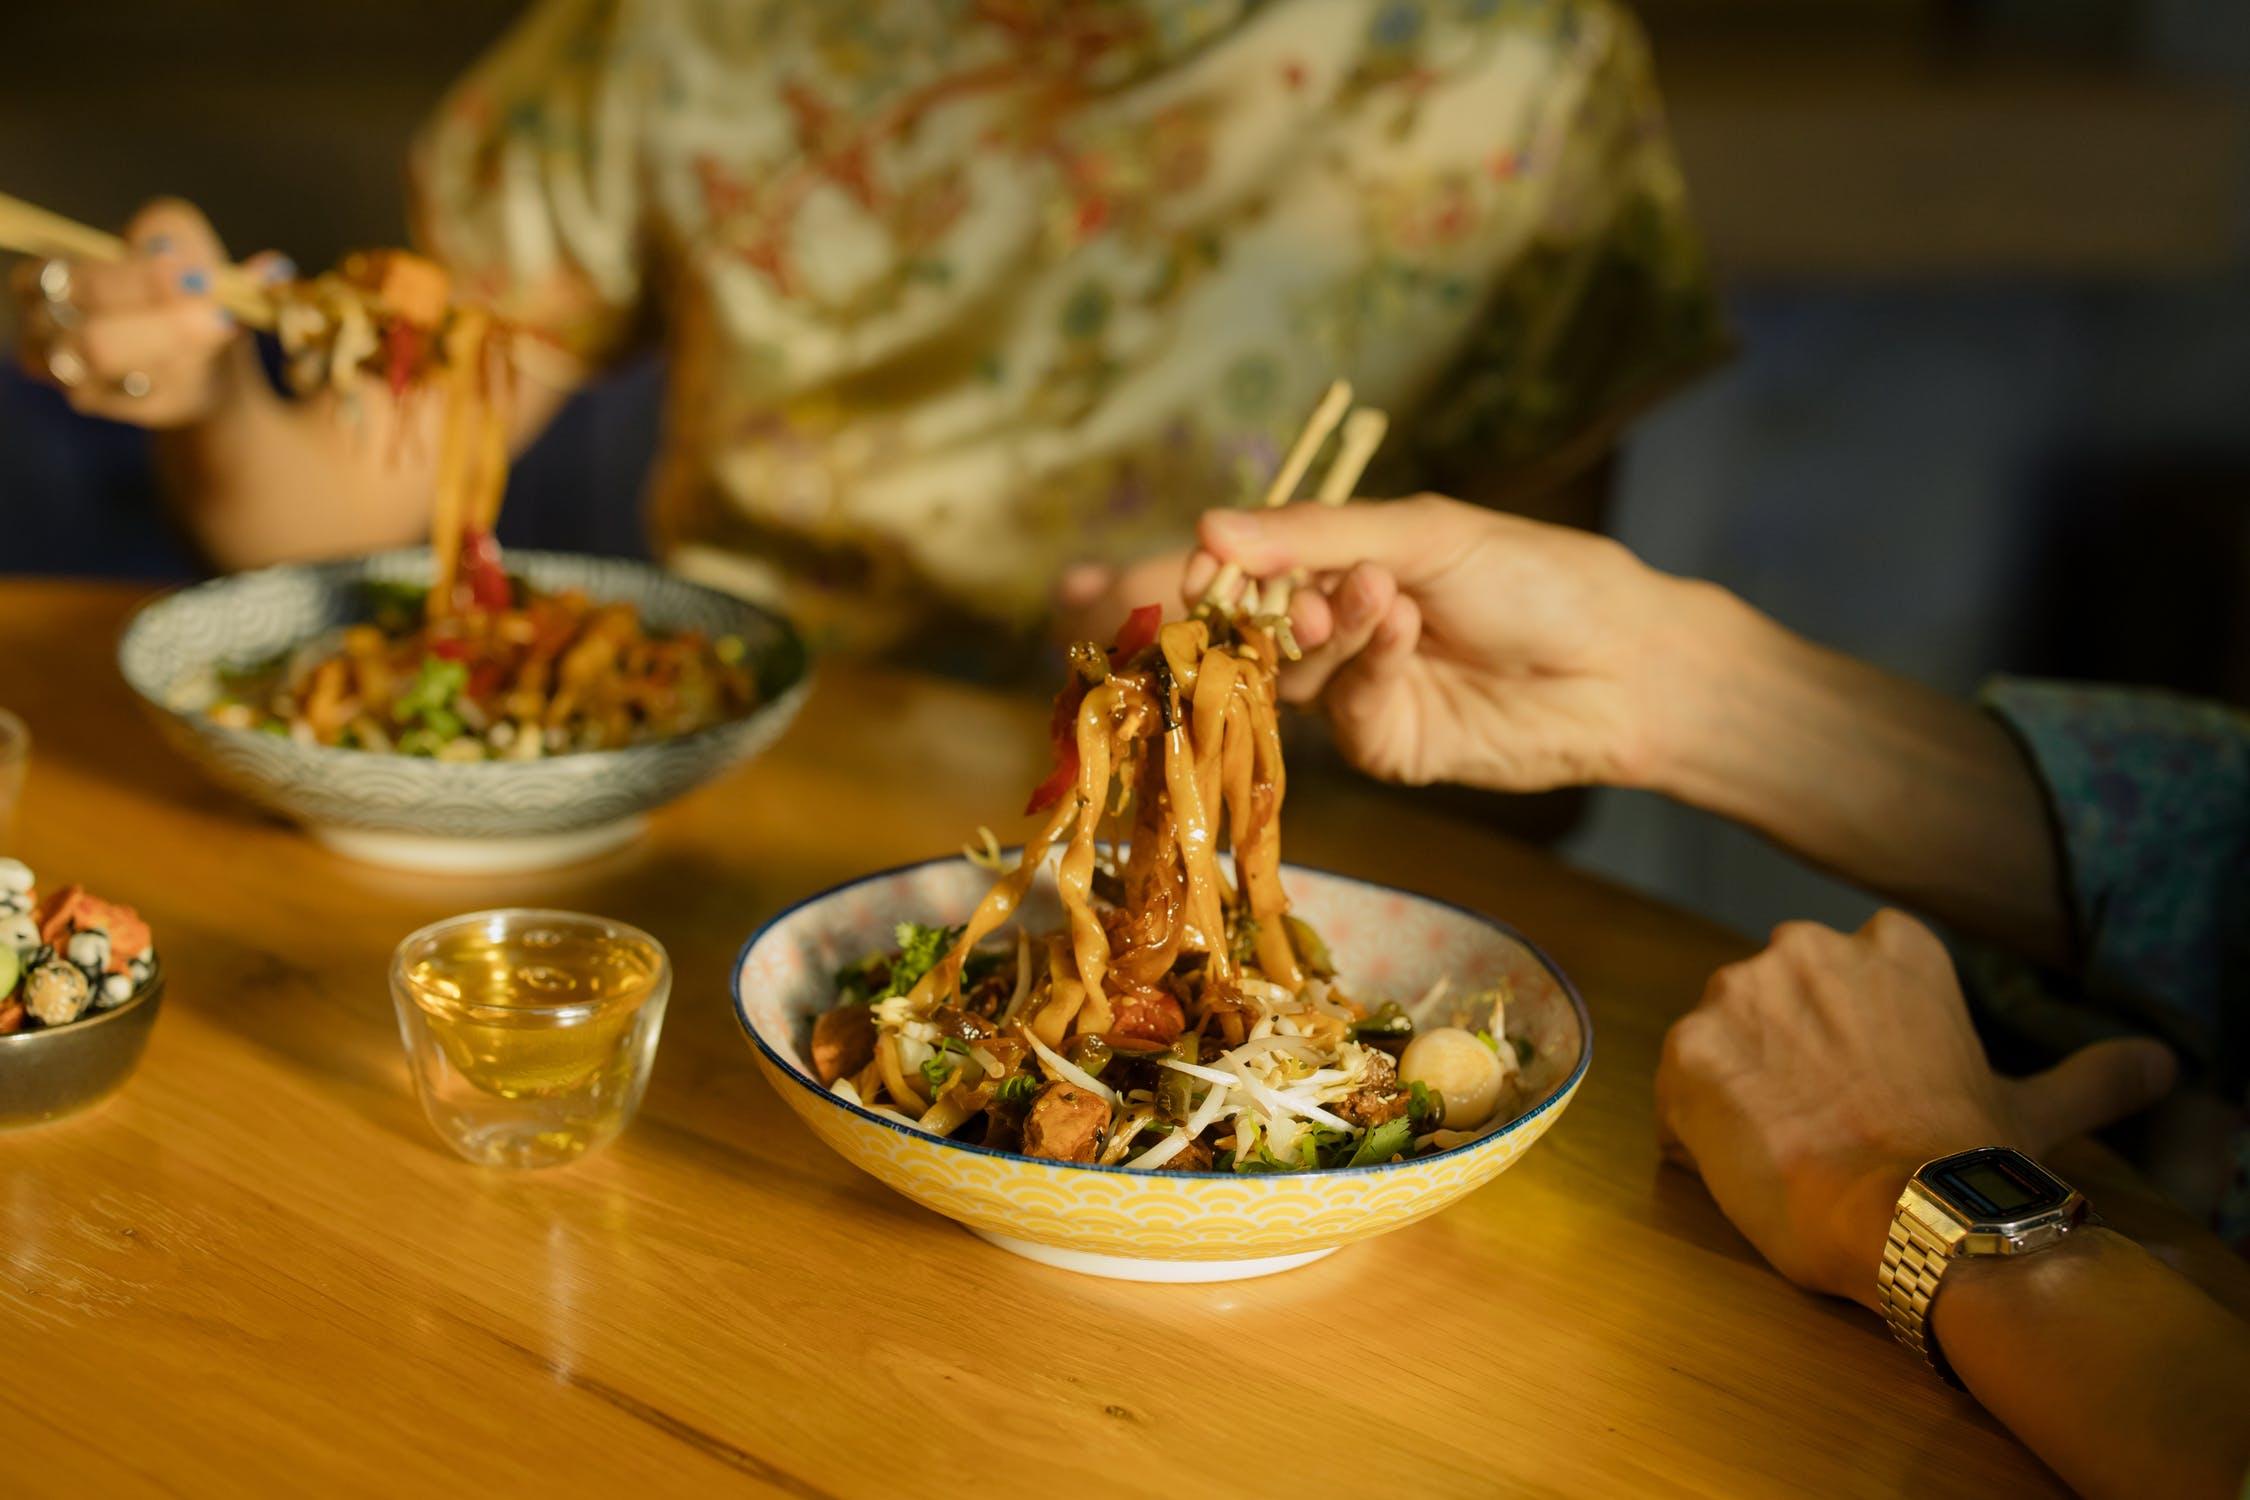 vietnam etiquette - finish everything in bowl